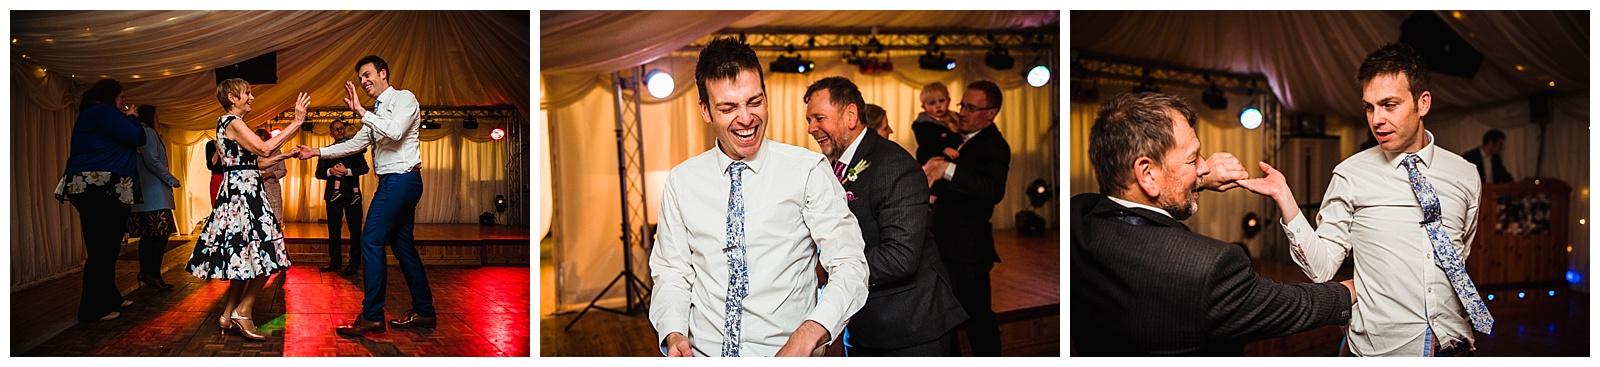 Candid wedding photos Yorkshire